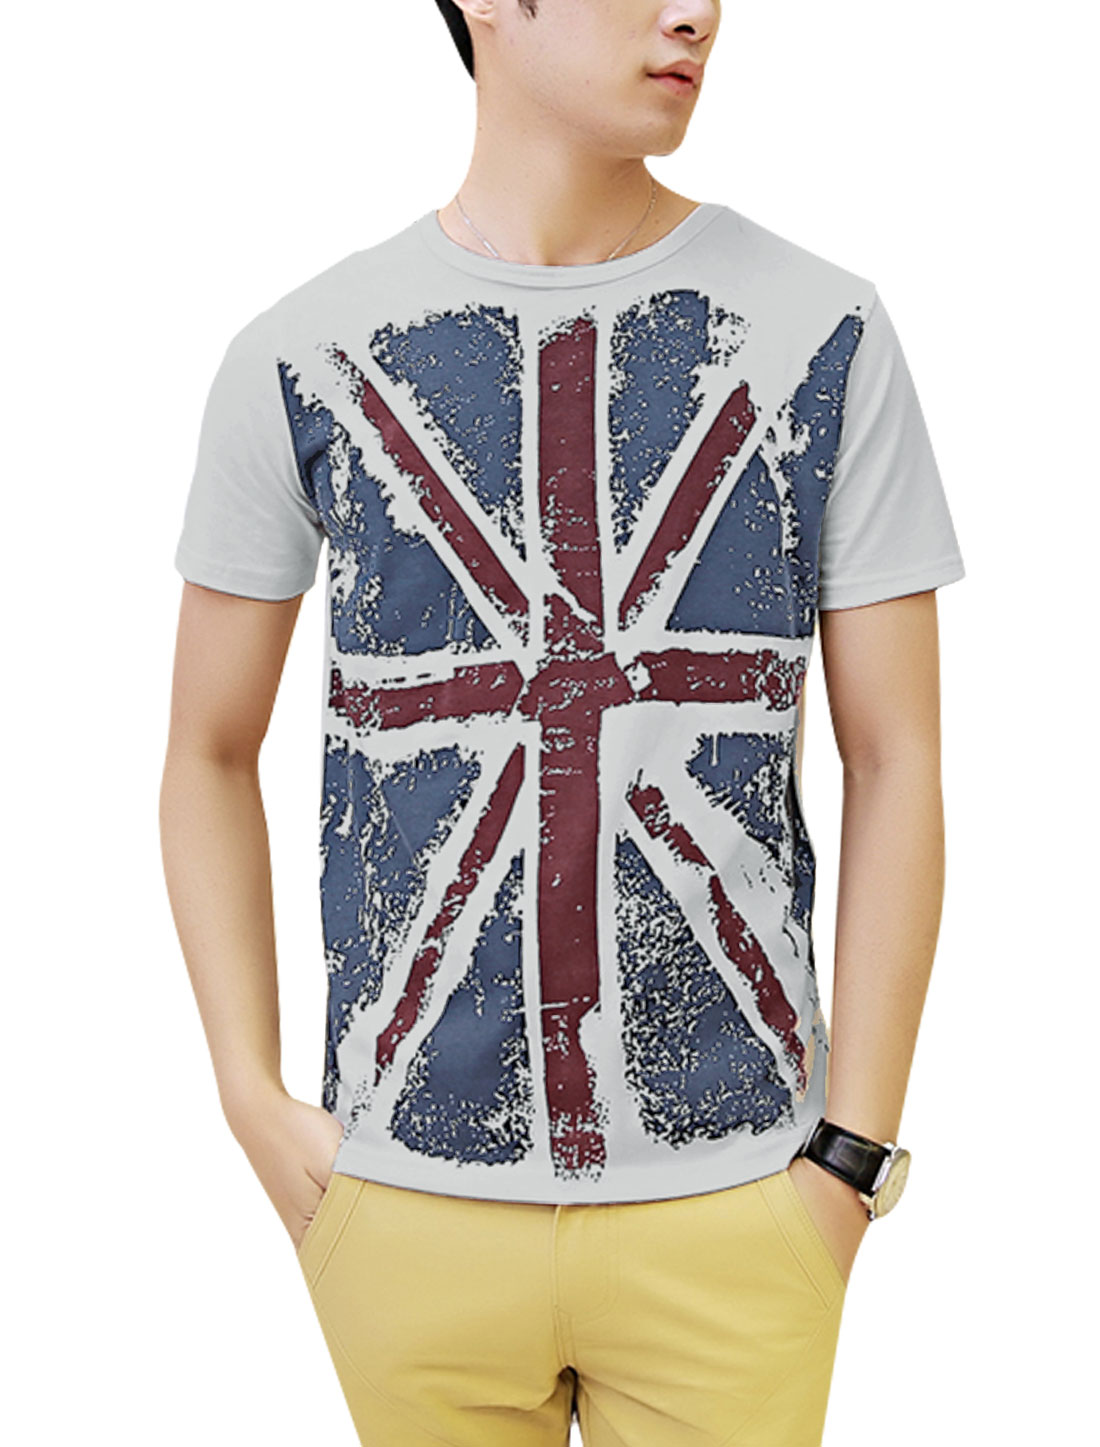 Men's Short Sleeve Union Jack Print Summer Fit Top Light Gray M